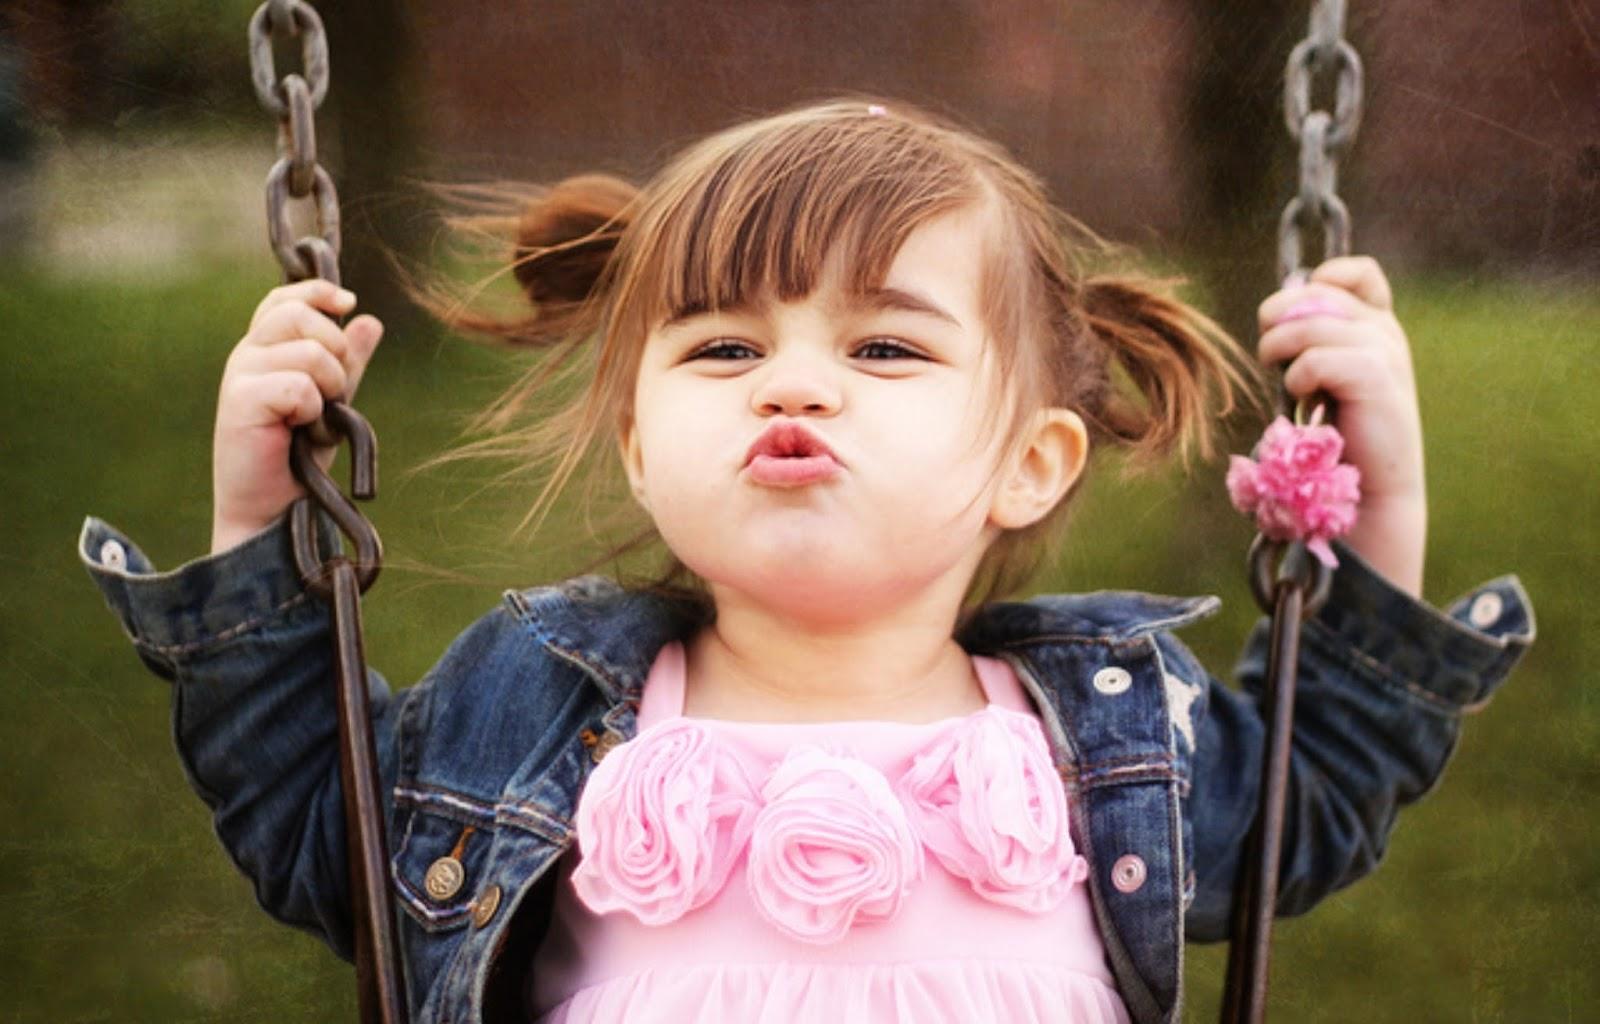 Latest Cute Baby - Sweet Baby HD Wallpaper in 1080p ...